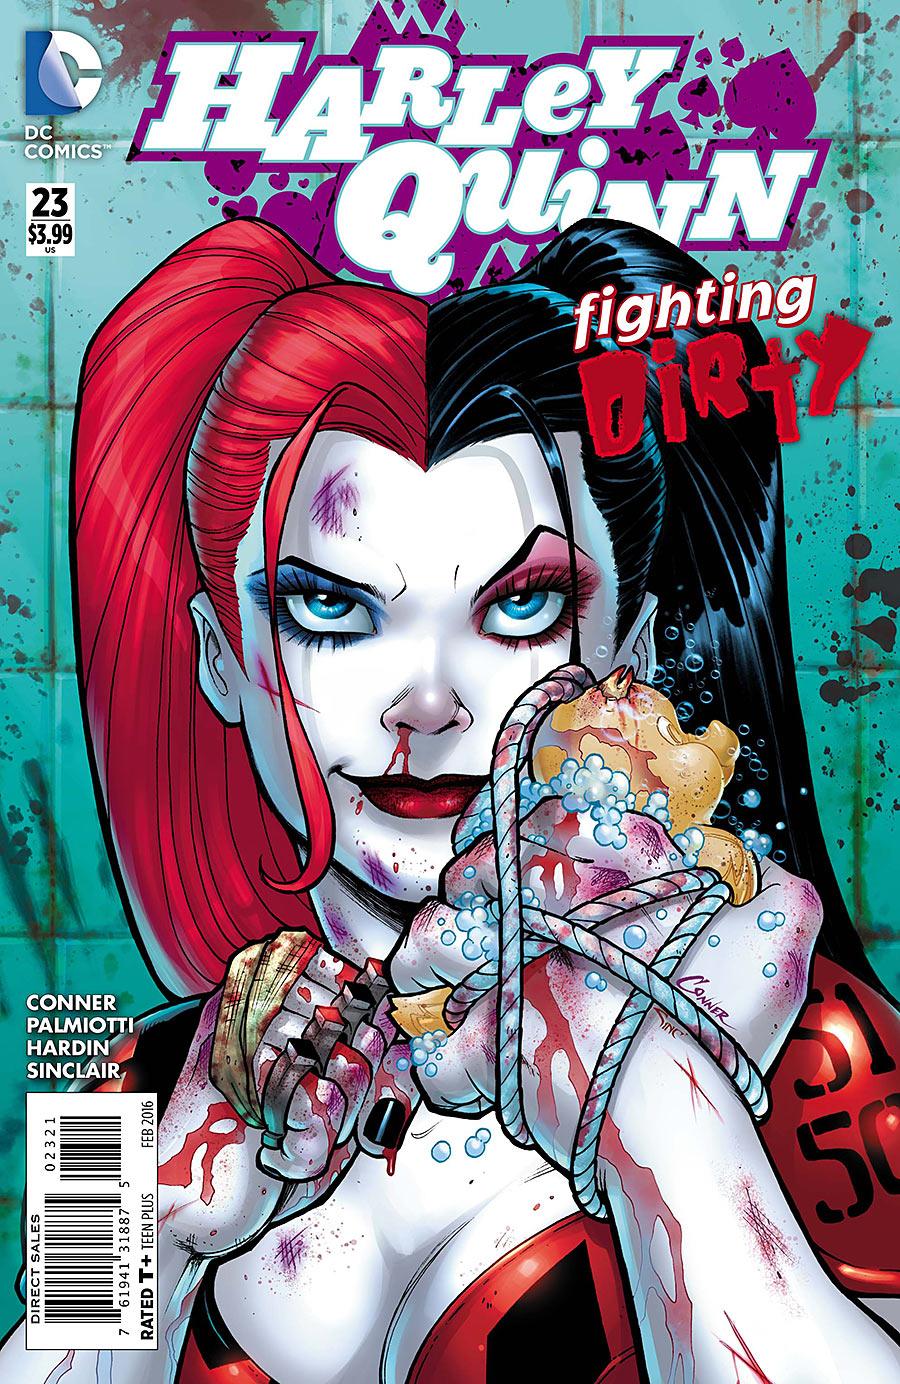 Image Harley Quinn Vol 2 23 Cover 2 Jpg Batman Wiki